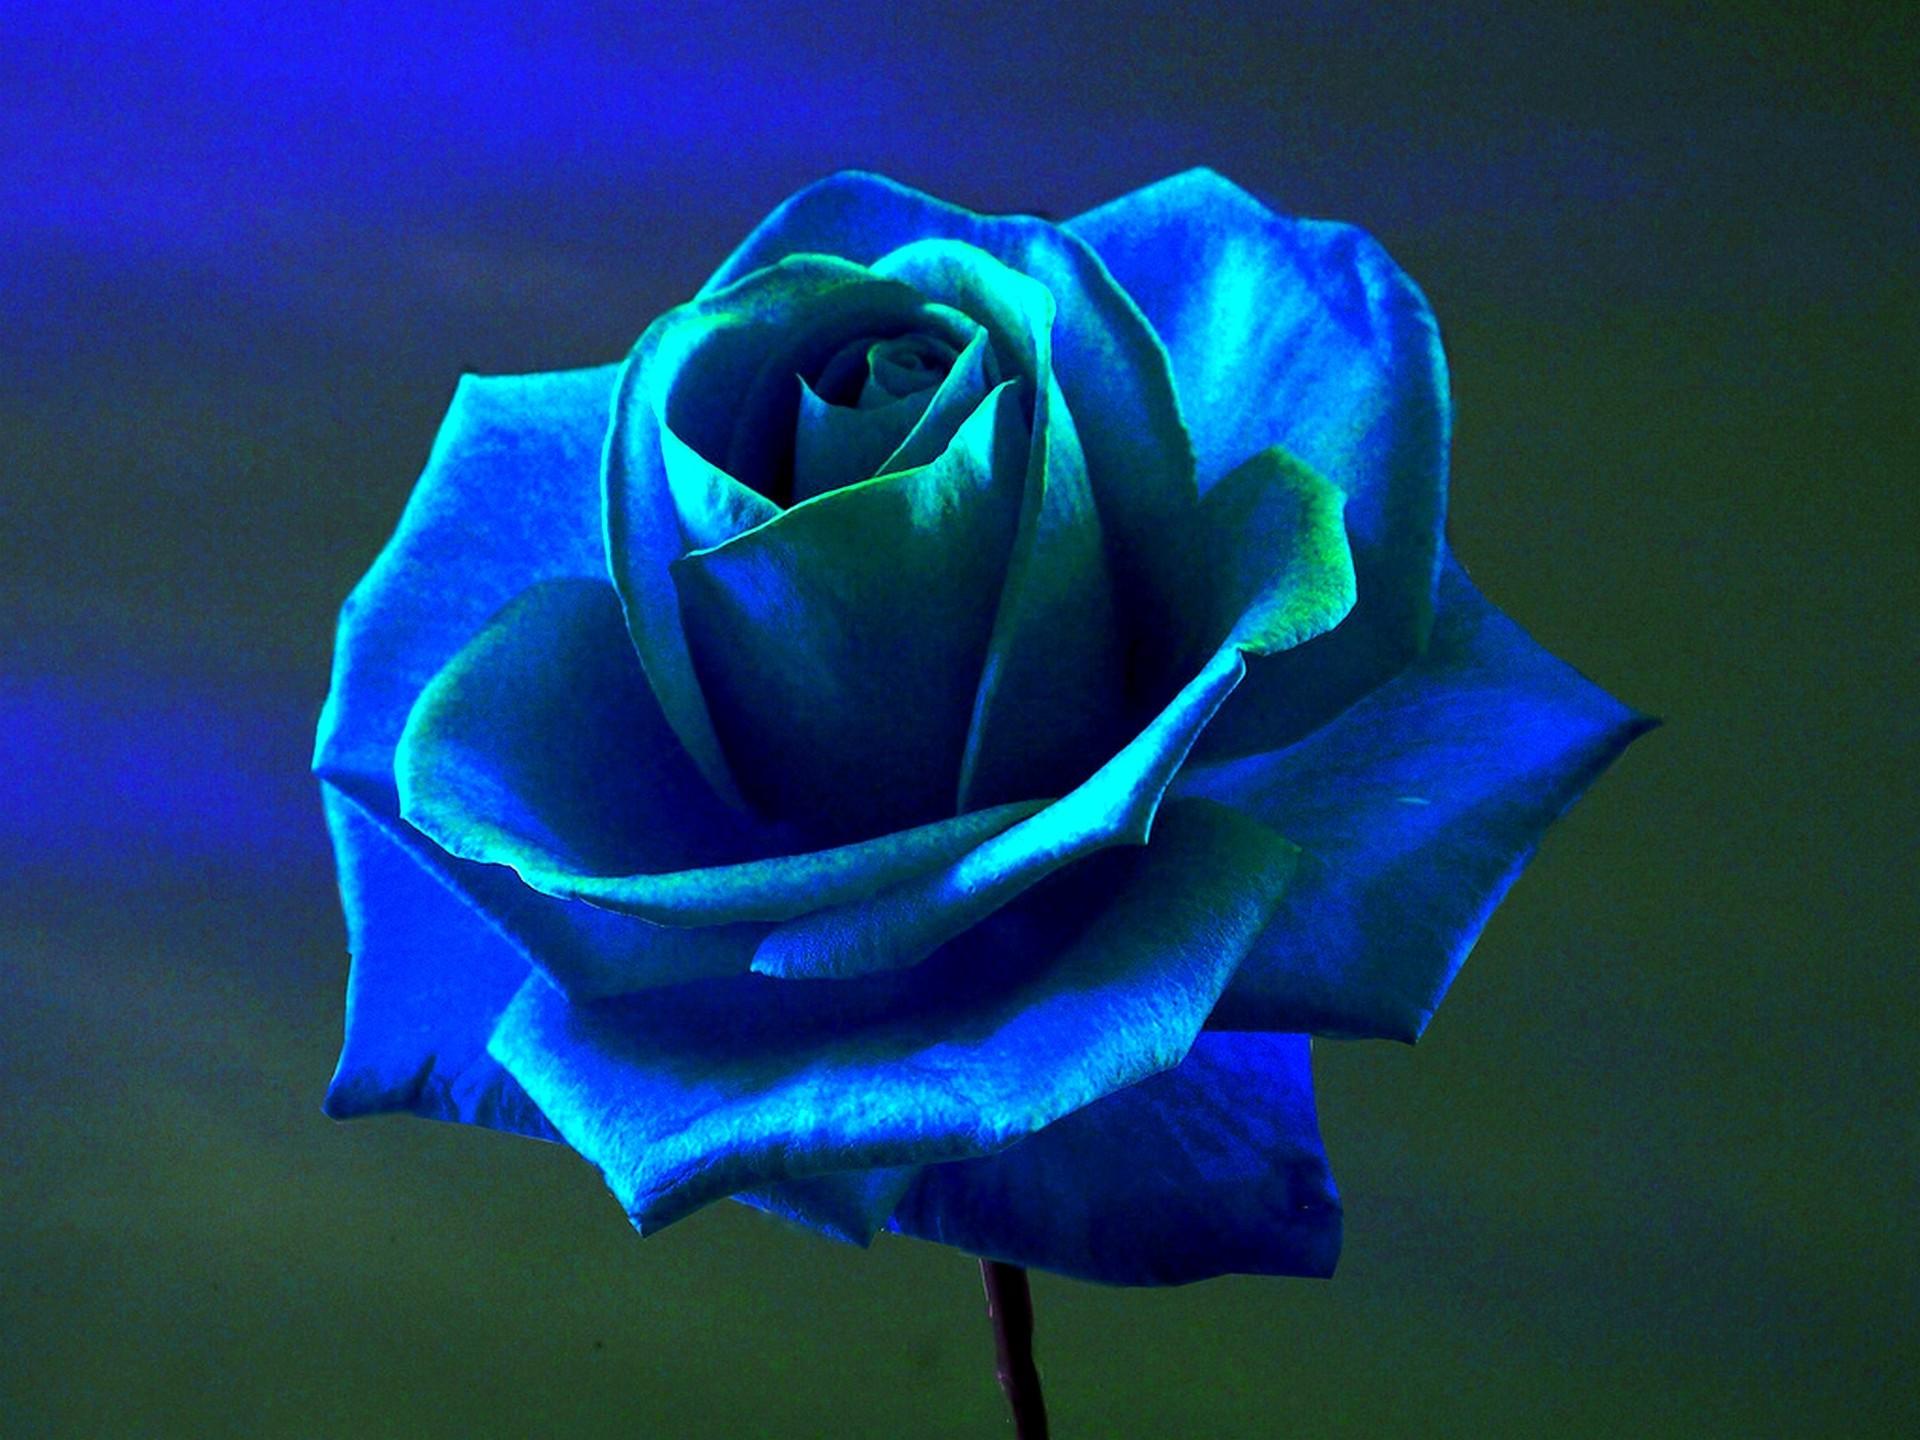 Wallpaper : 1920x1440 px, blue flowers, blue rose 1920x1440